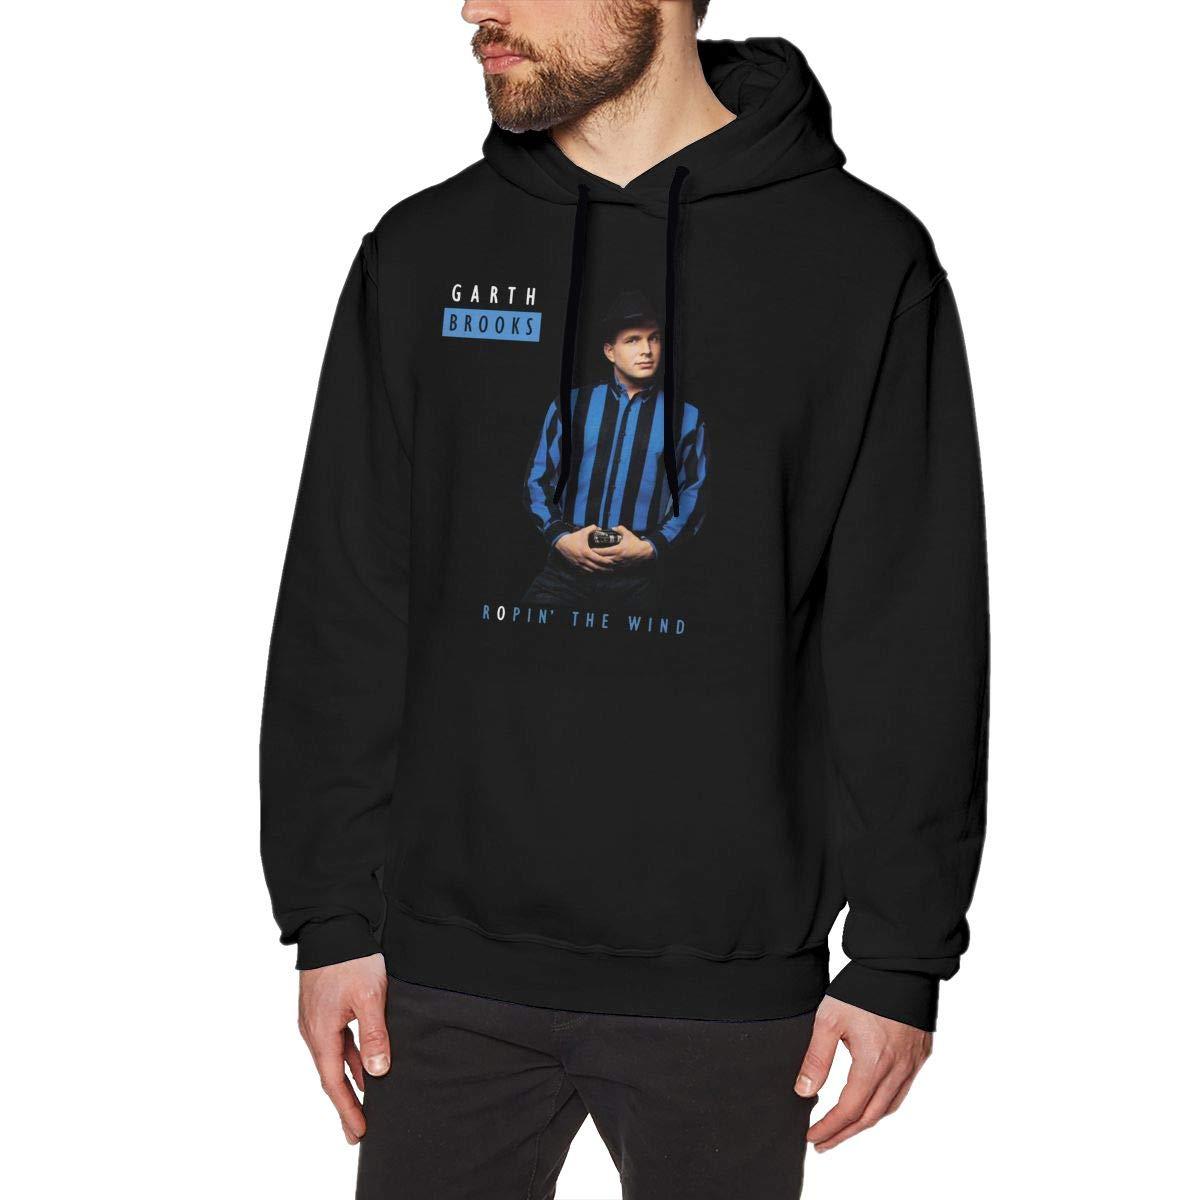 Garth Brooks Ropin The Wind S S Sweater Black Shirts